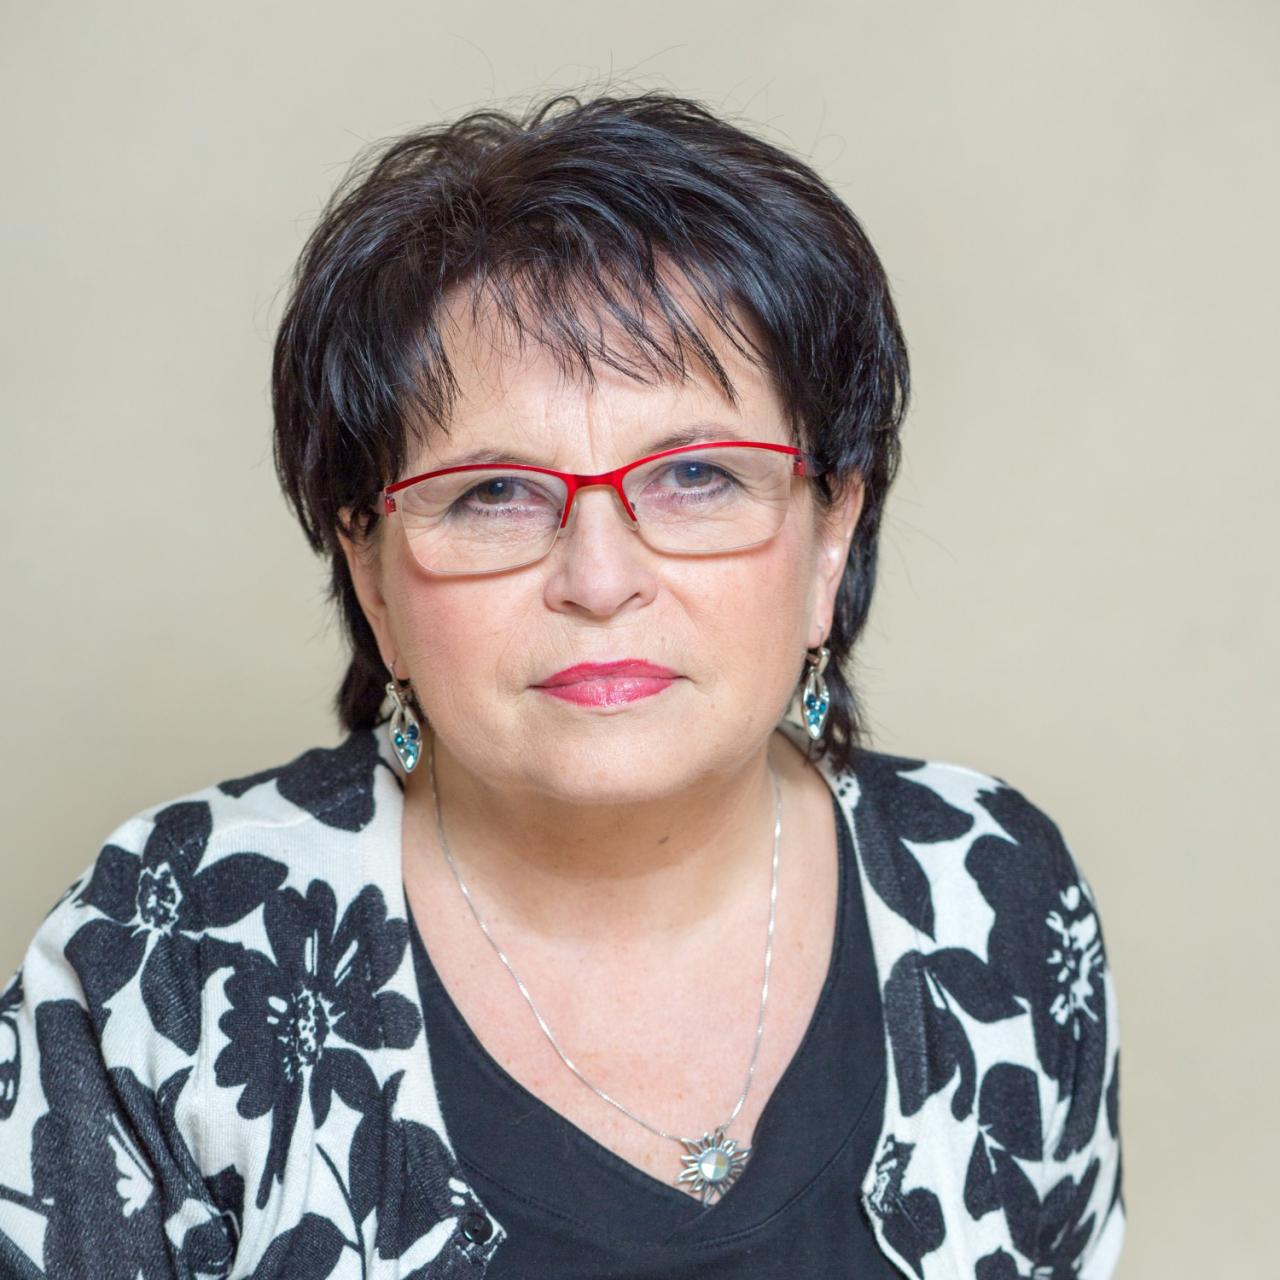 Marie Dolejšová